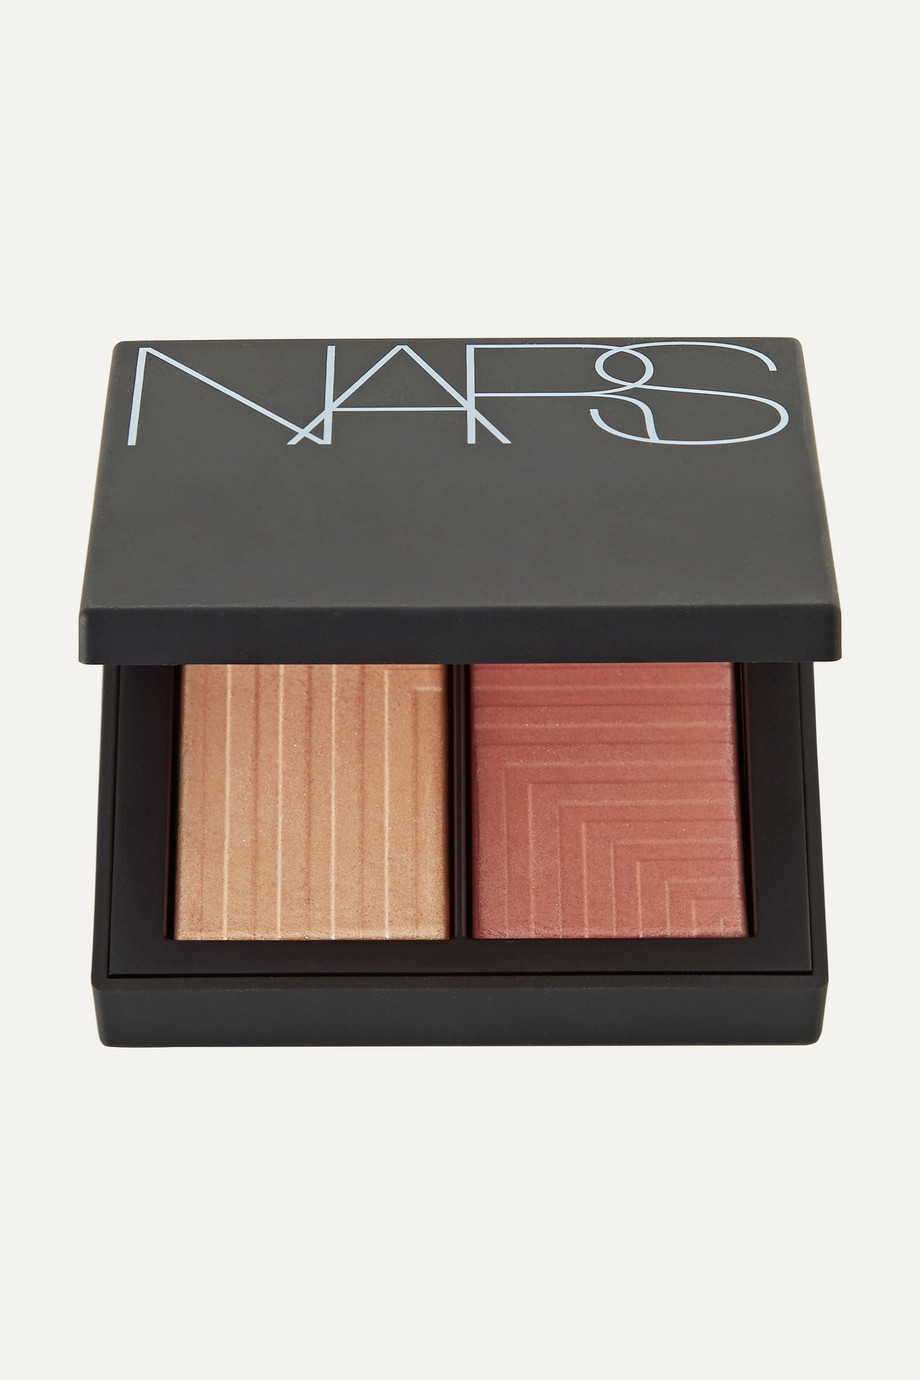 NARS Dual-Intensity Blush - Frenzy